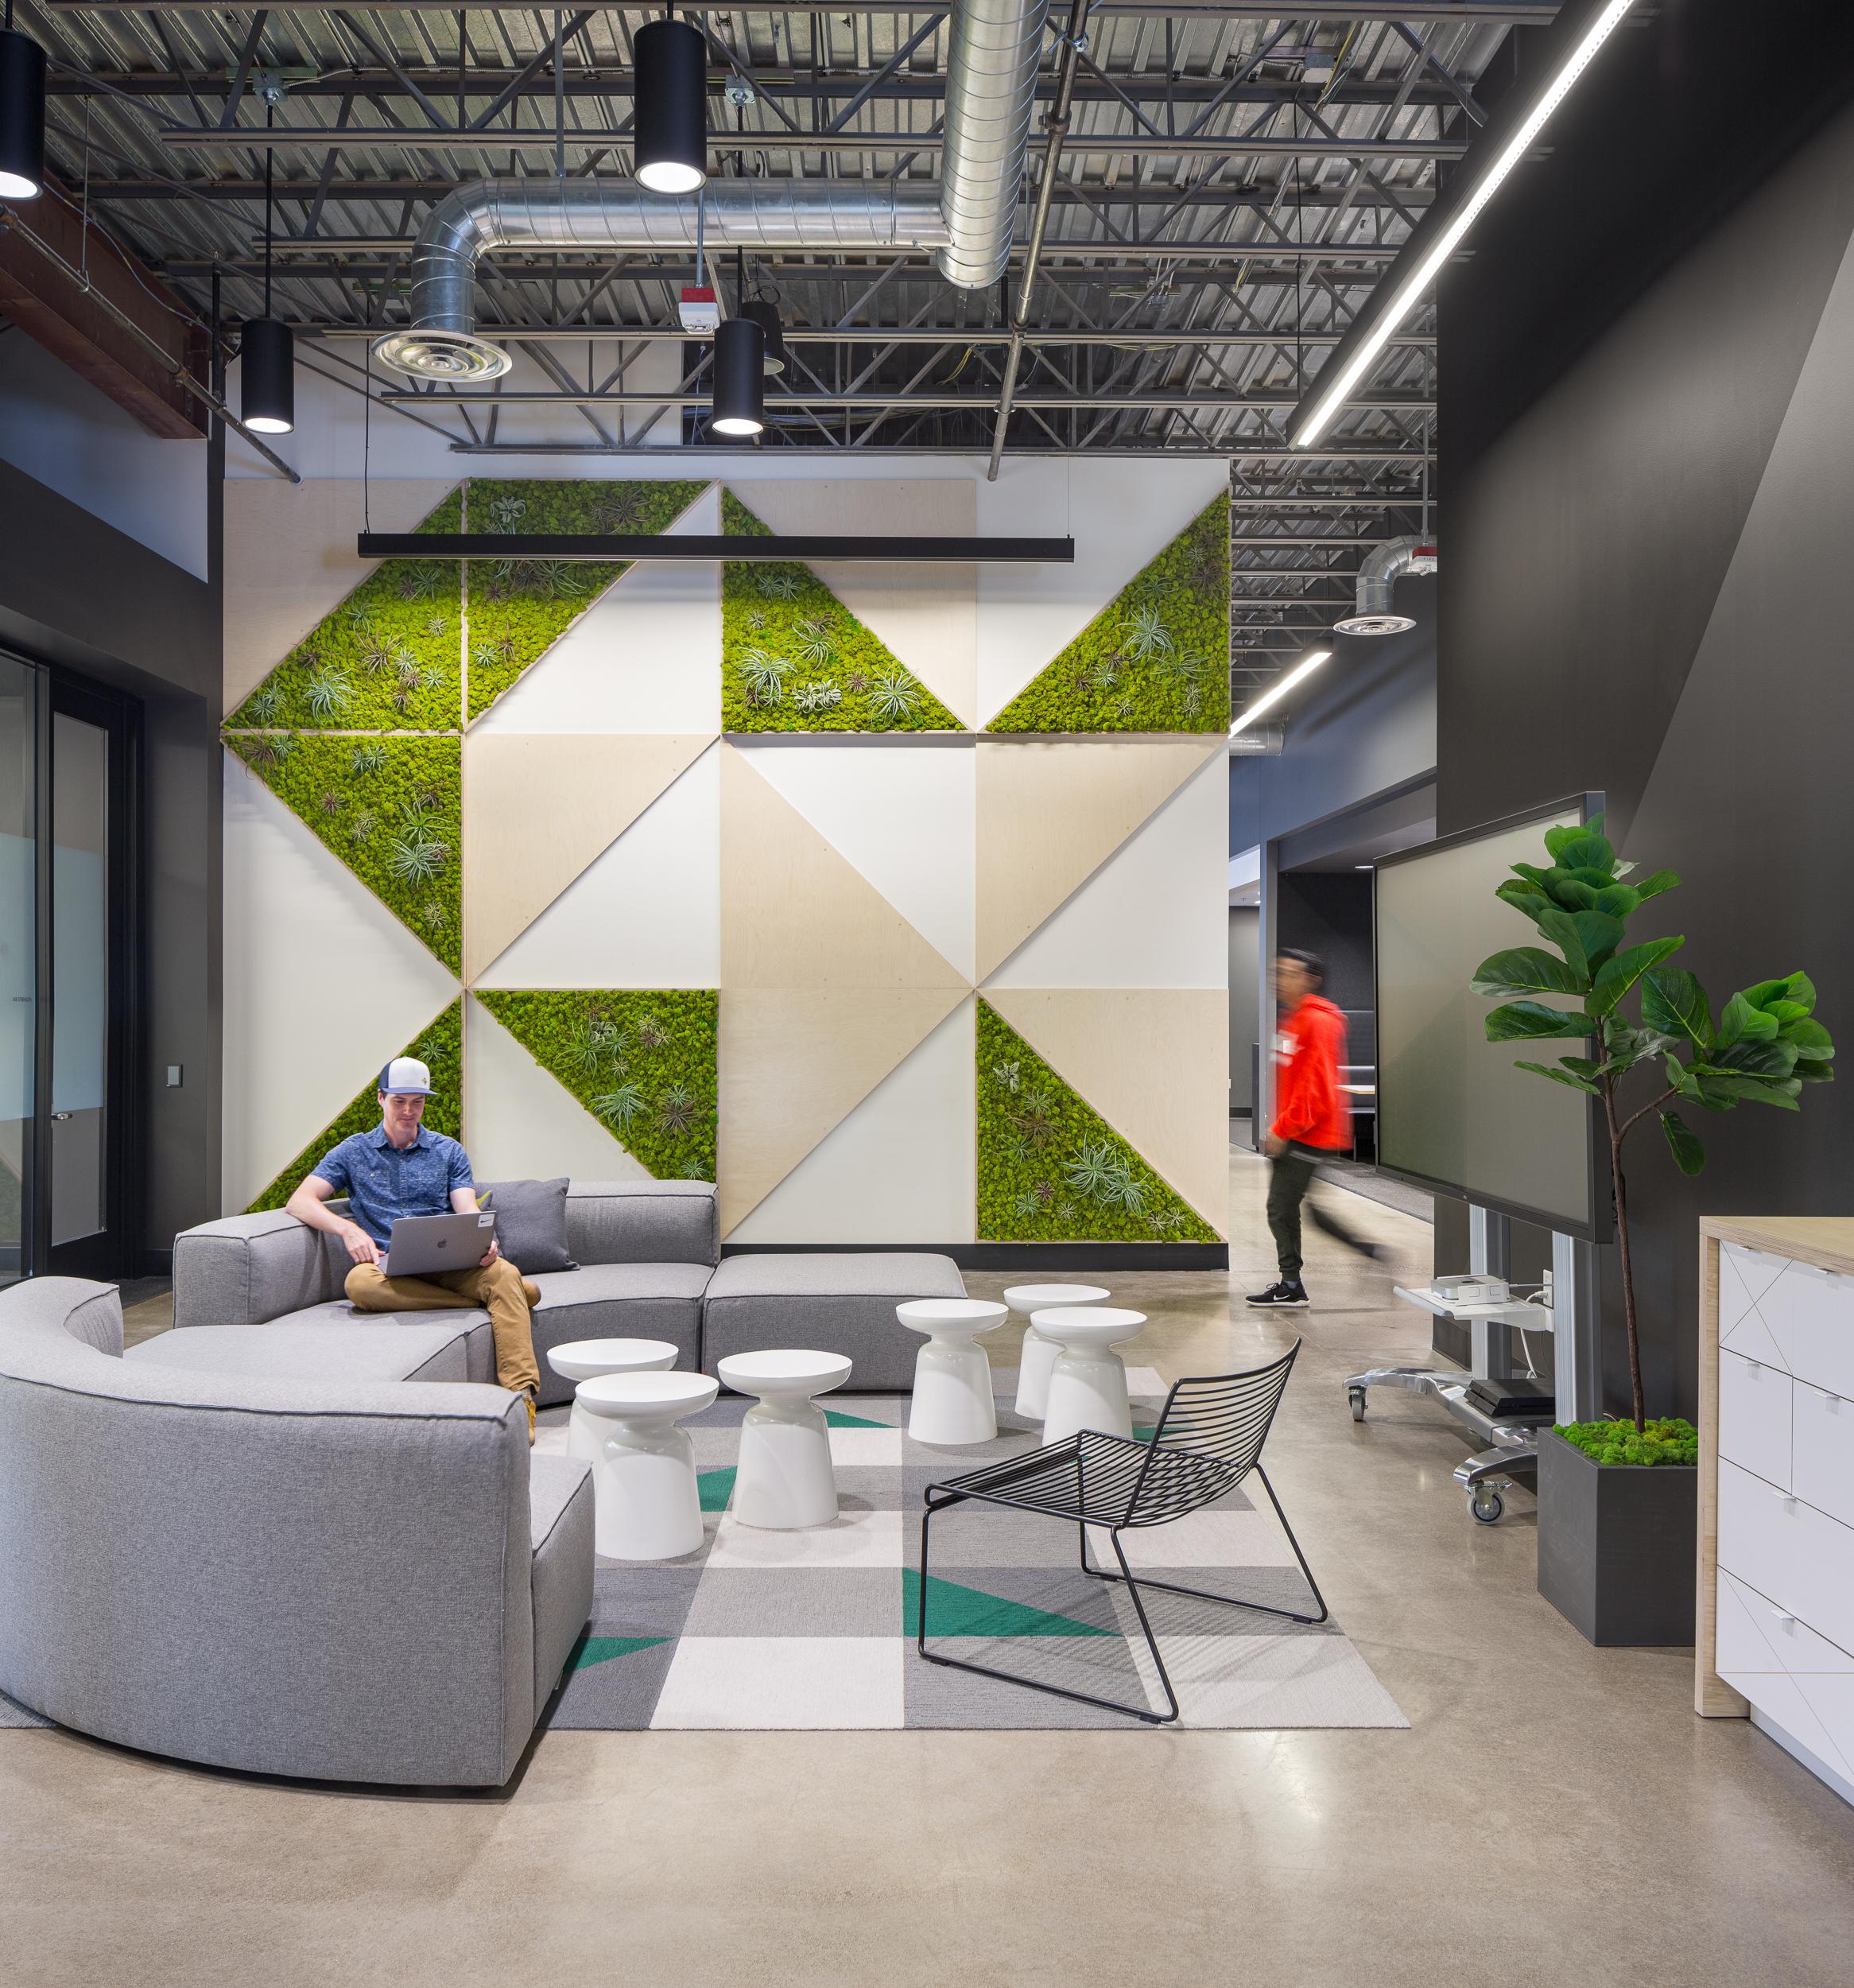 Nike, Talaria Building / STUDIO BUTCH